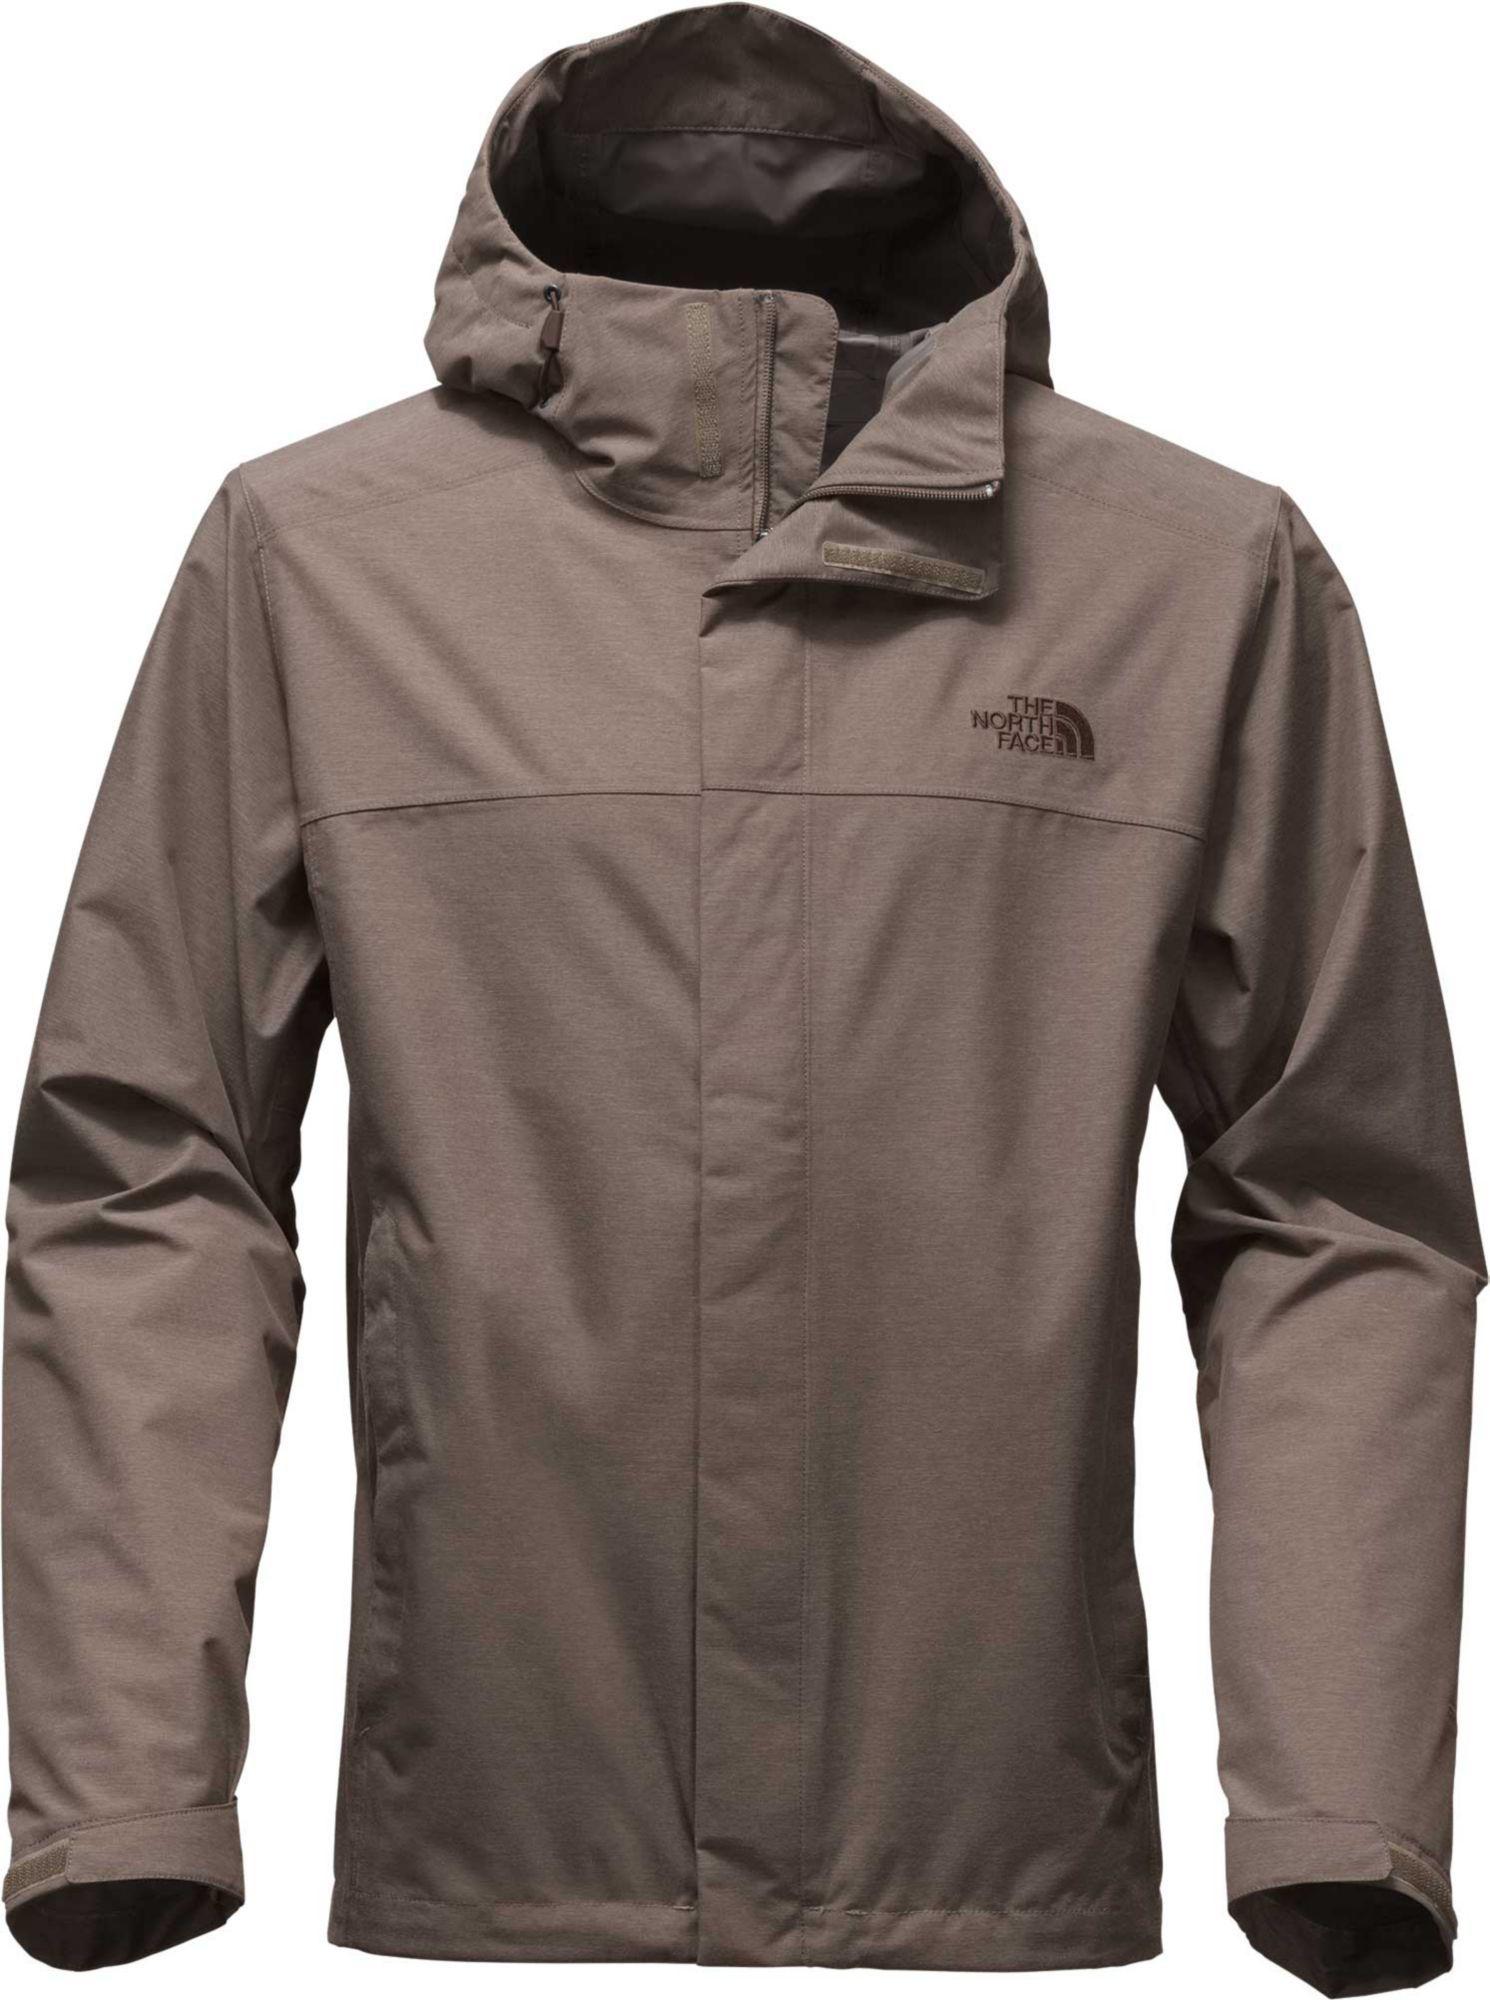 The North Face Men's Venture 2 Jacket (Regular and Big